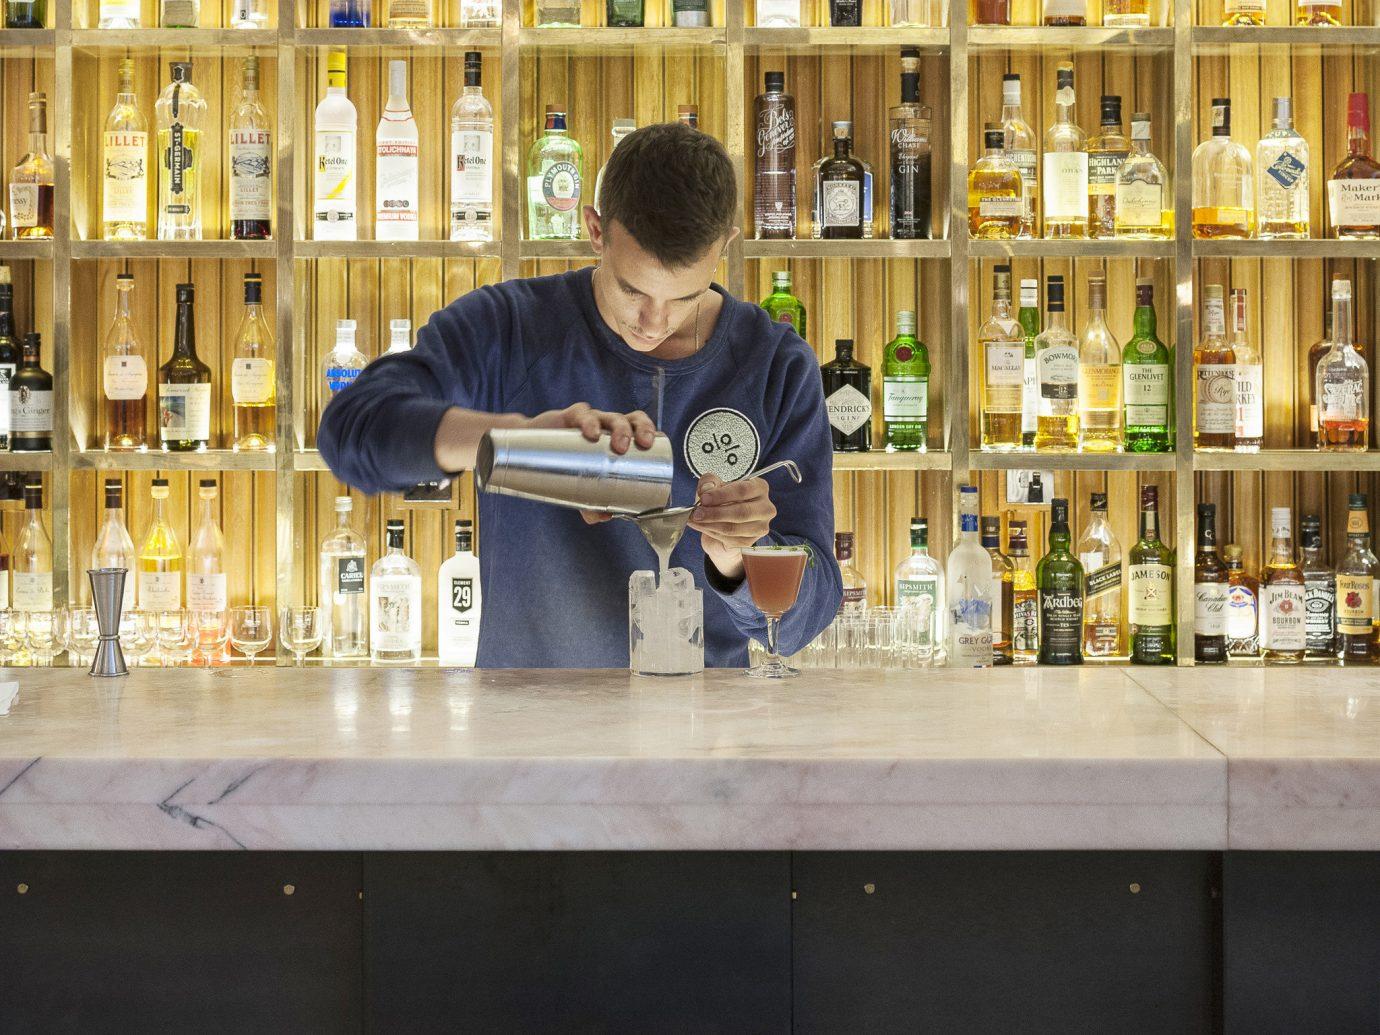 Budget Hotels London indoor person room restaurant interior design Bar Design coffeehouse store public